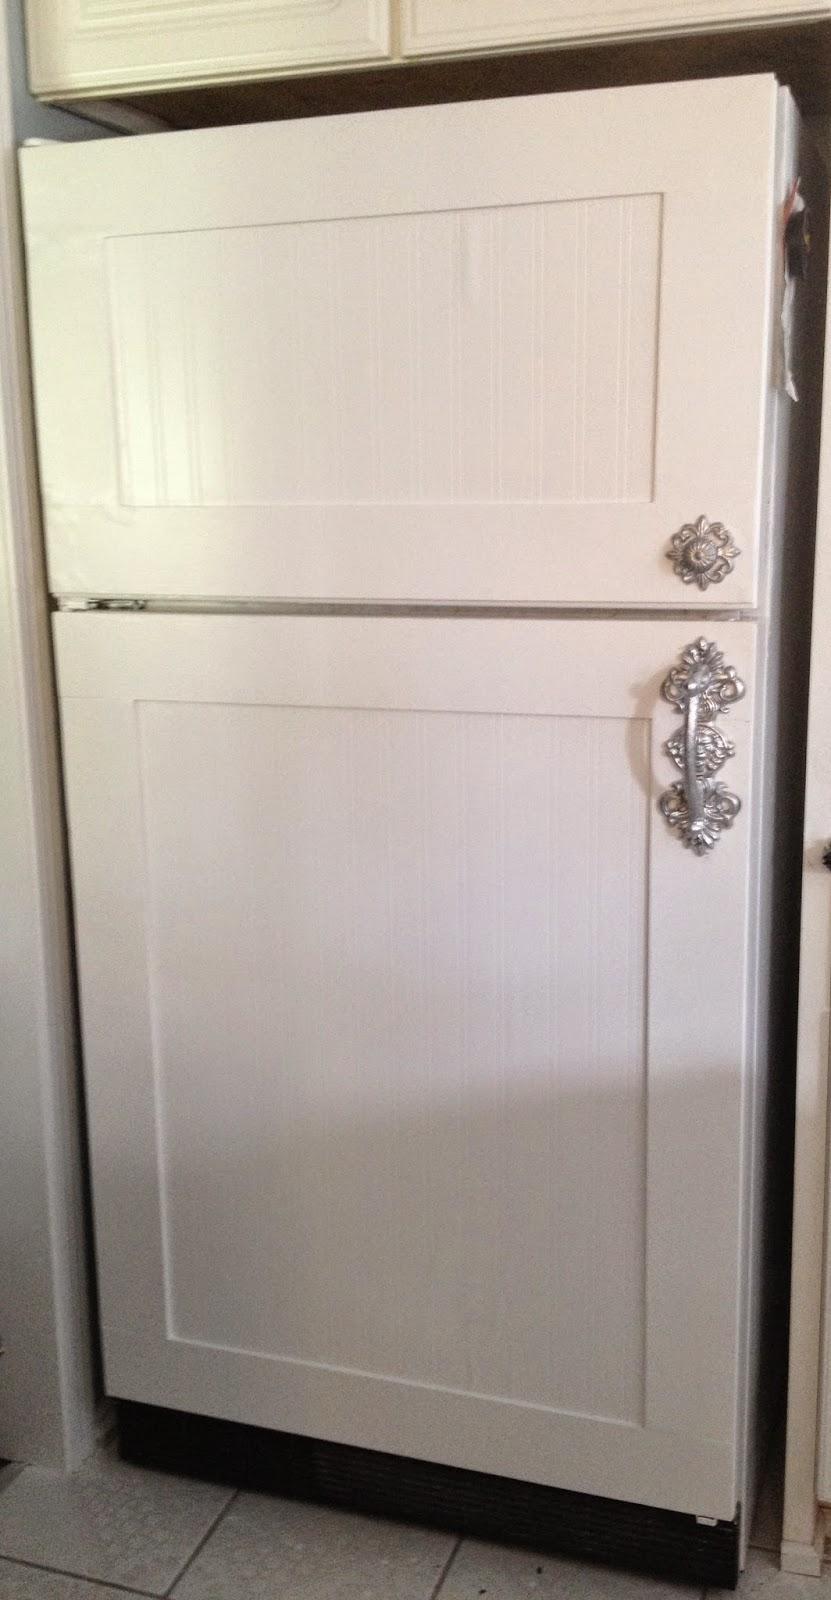 General Splendour Ugly Refrigerator Makeover With